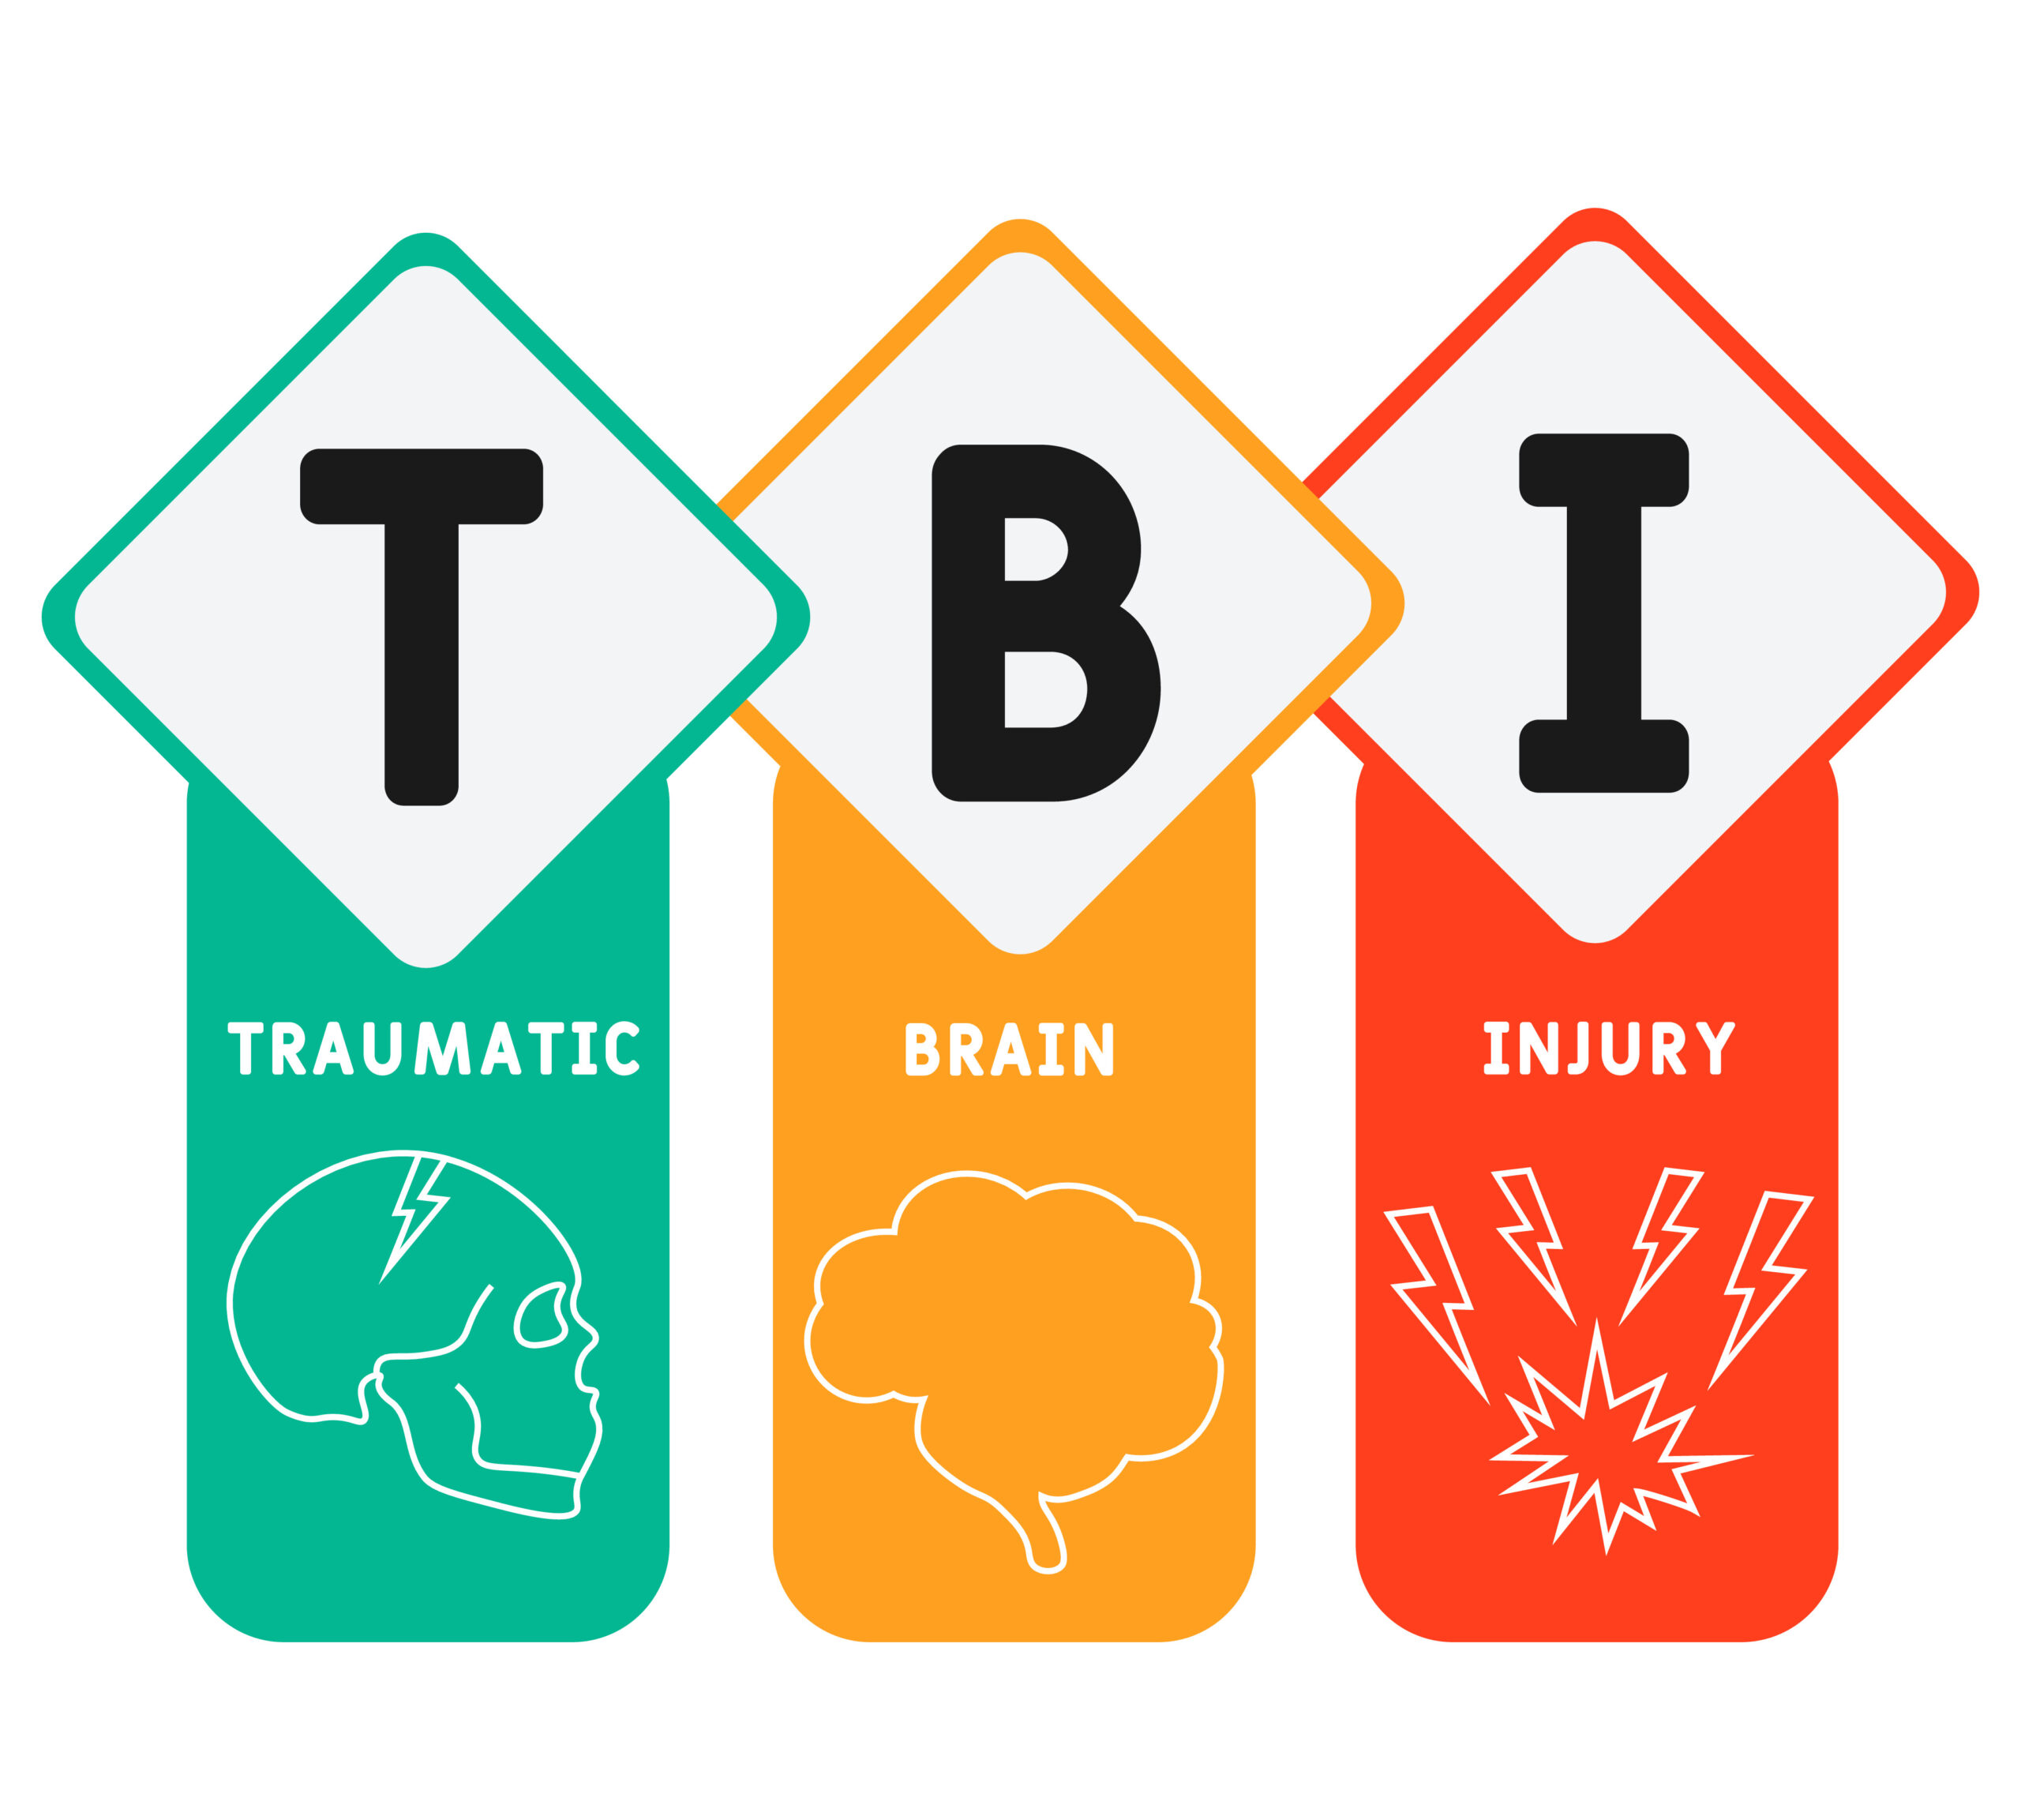 Preventing Traumatic Brain Injury